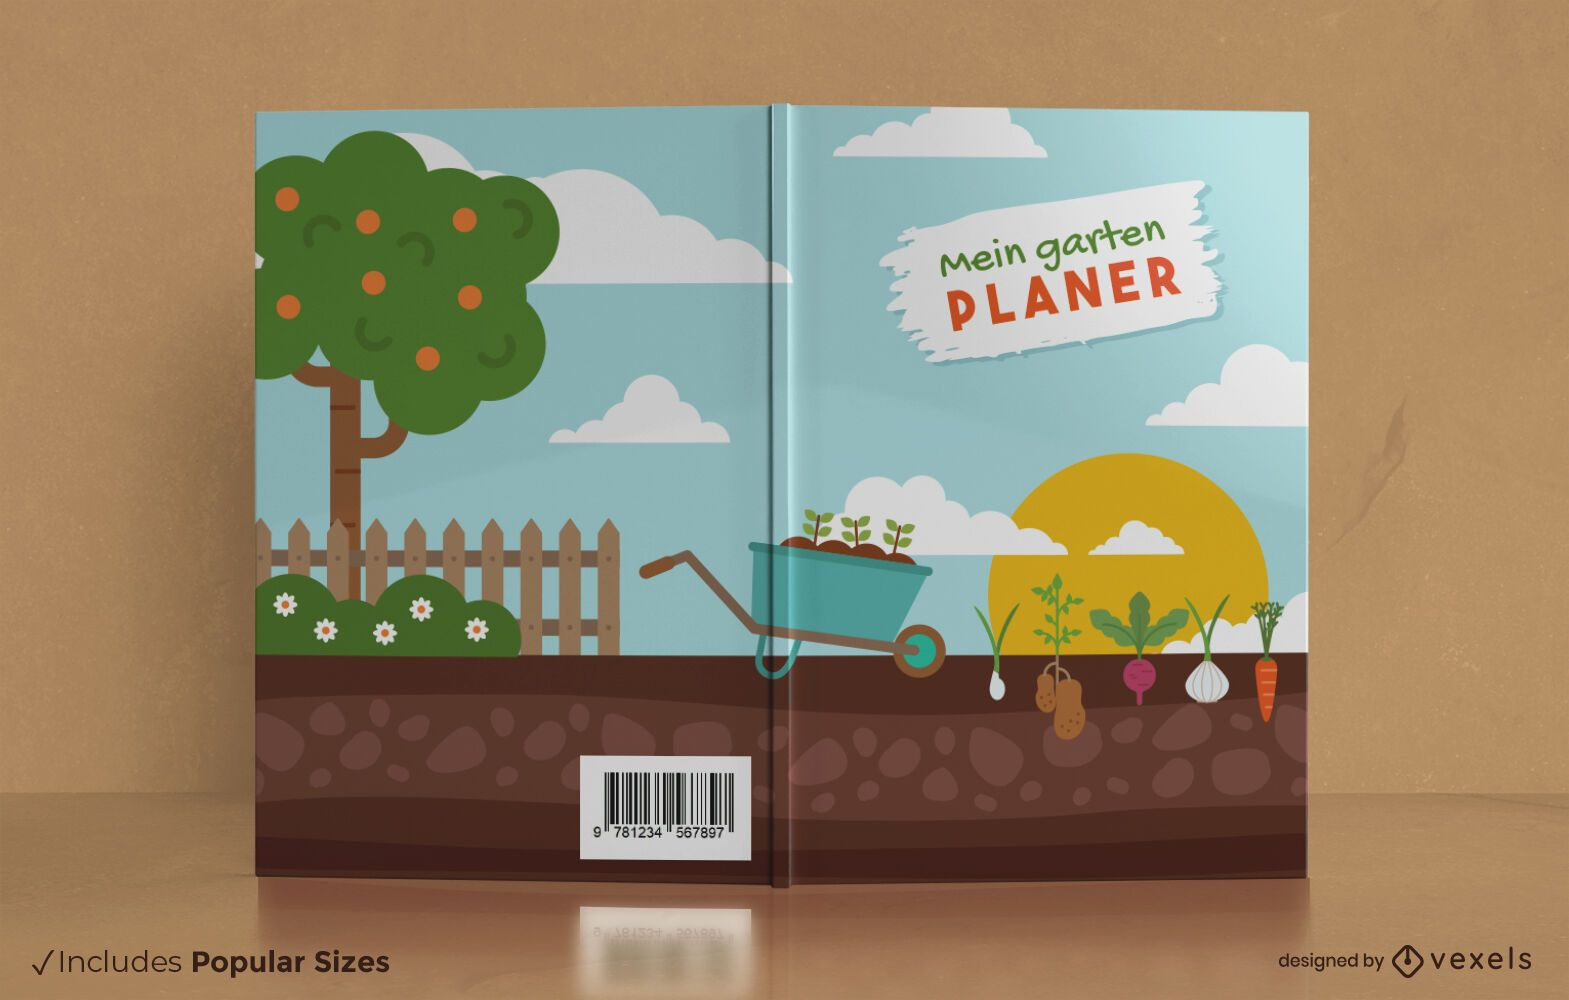 Diseño de portada de libro mein garten planer